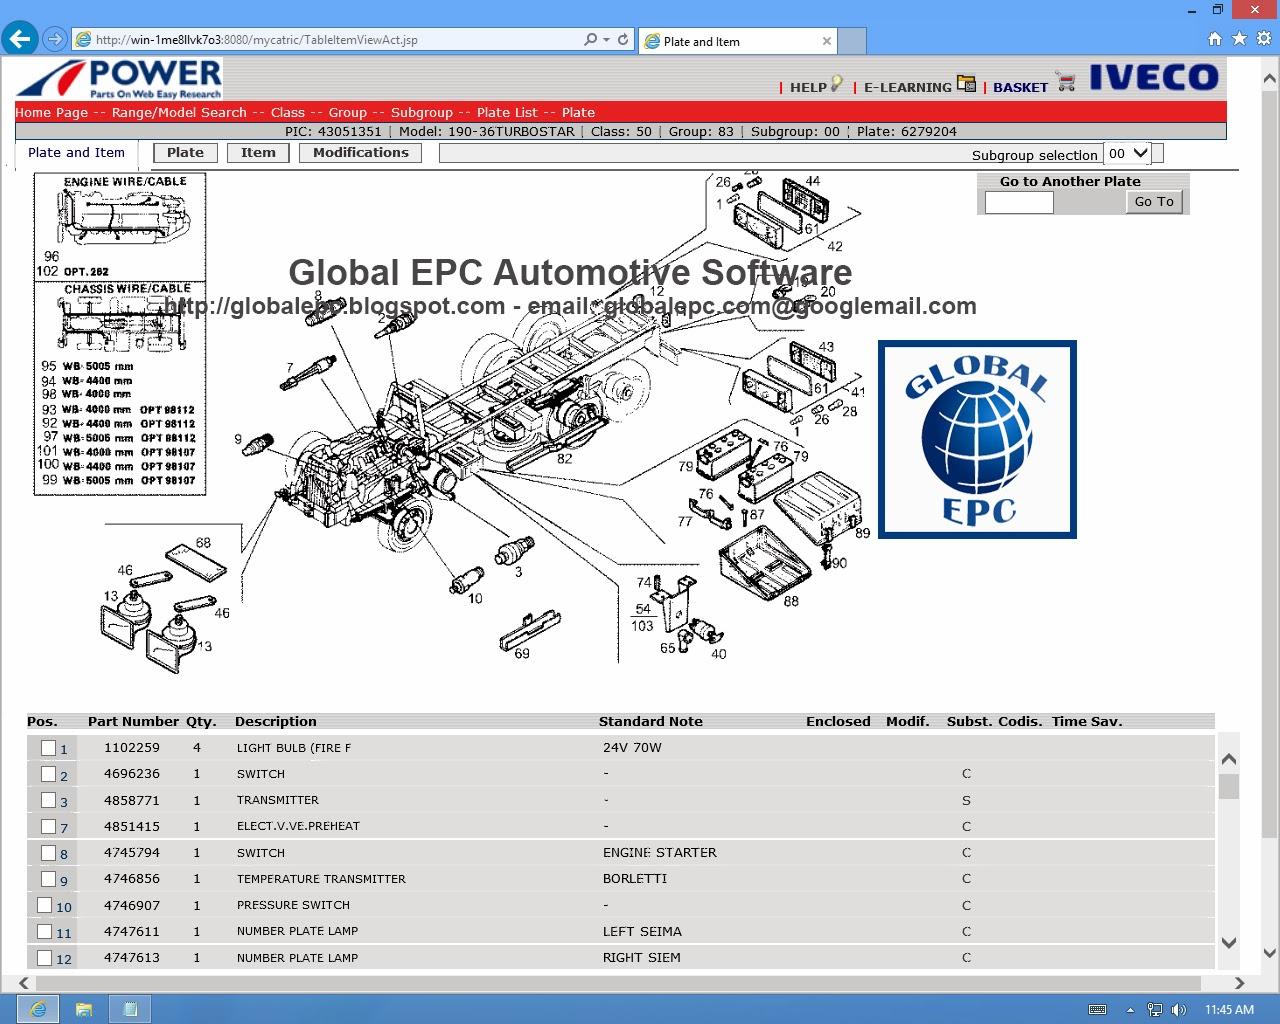 Jaguar Epc Online 2019 2020 Top Car Designs Bmw E83 Relase Hatch Switch Wiring Diagrams Parliamo Italiano Binder Ready Version Pdf Books To